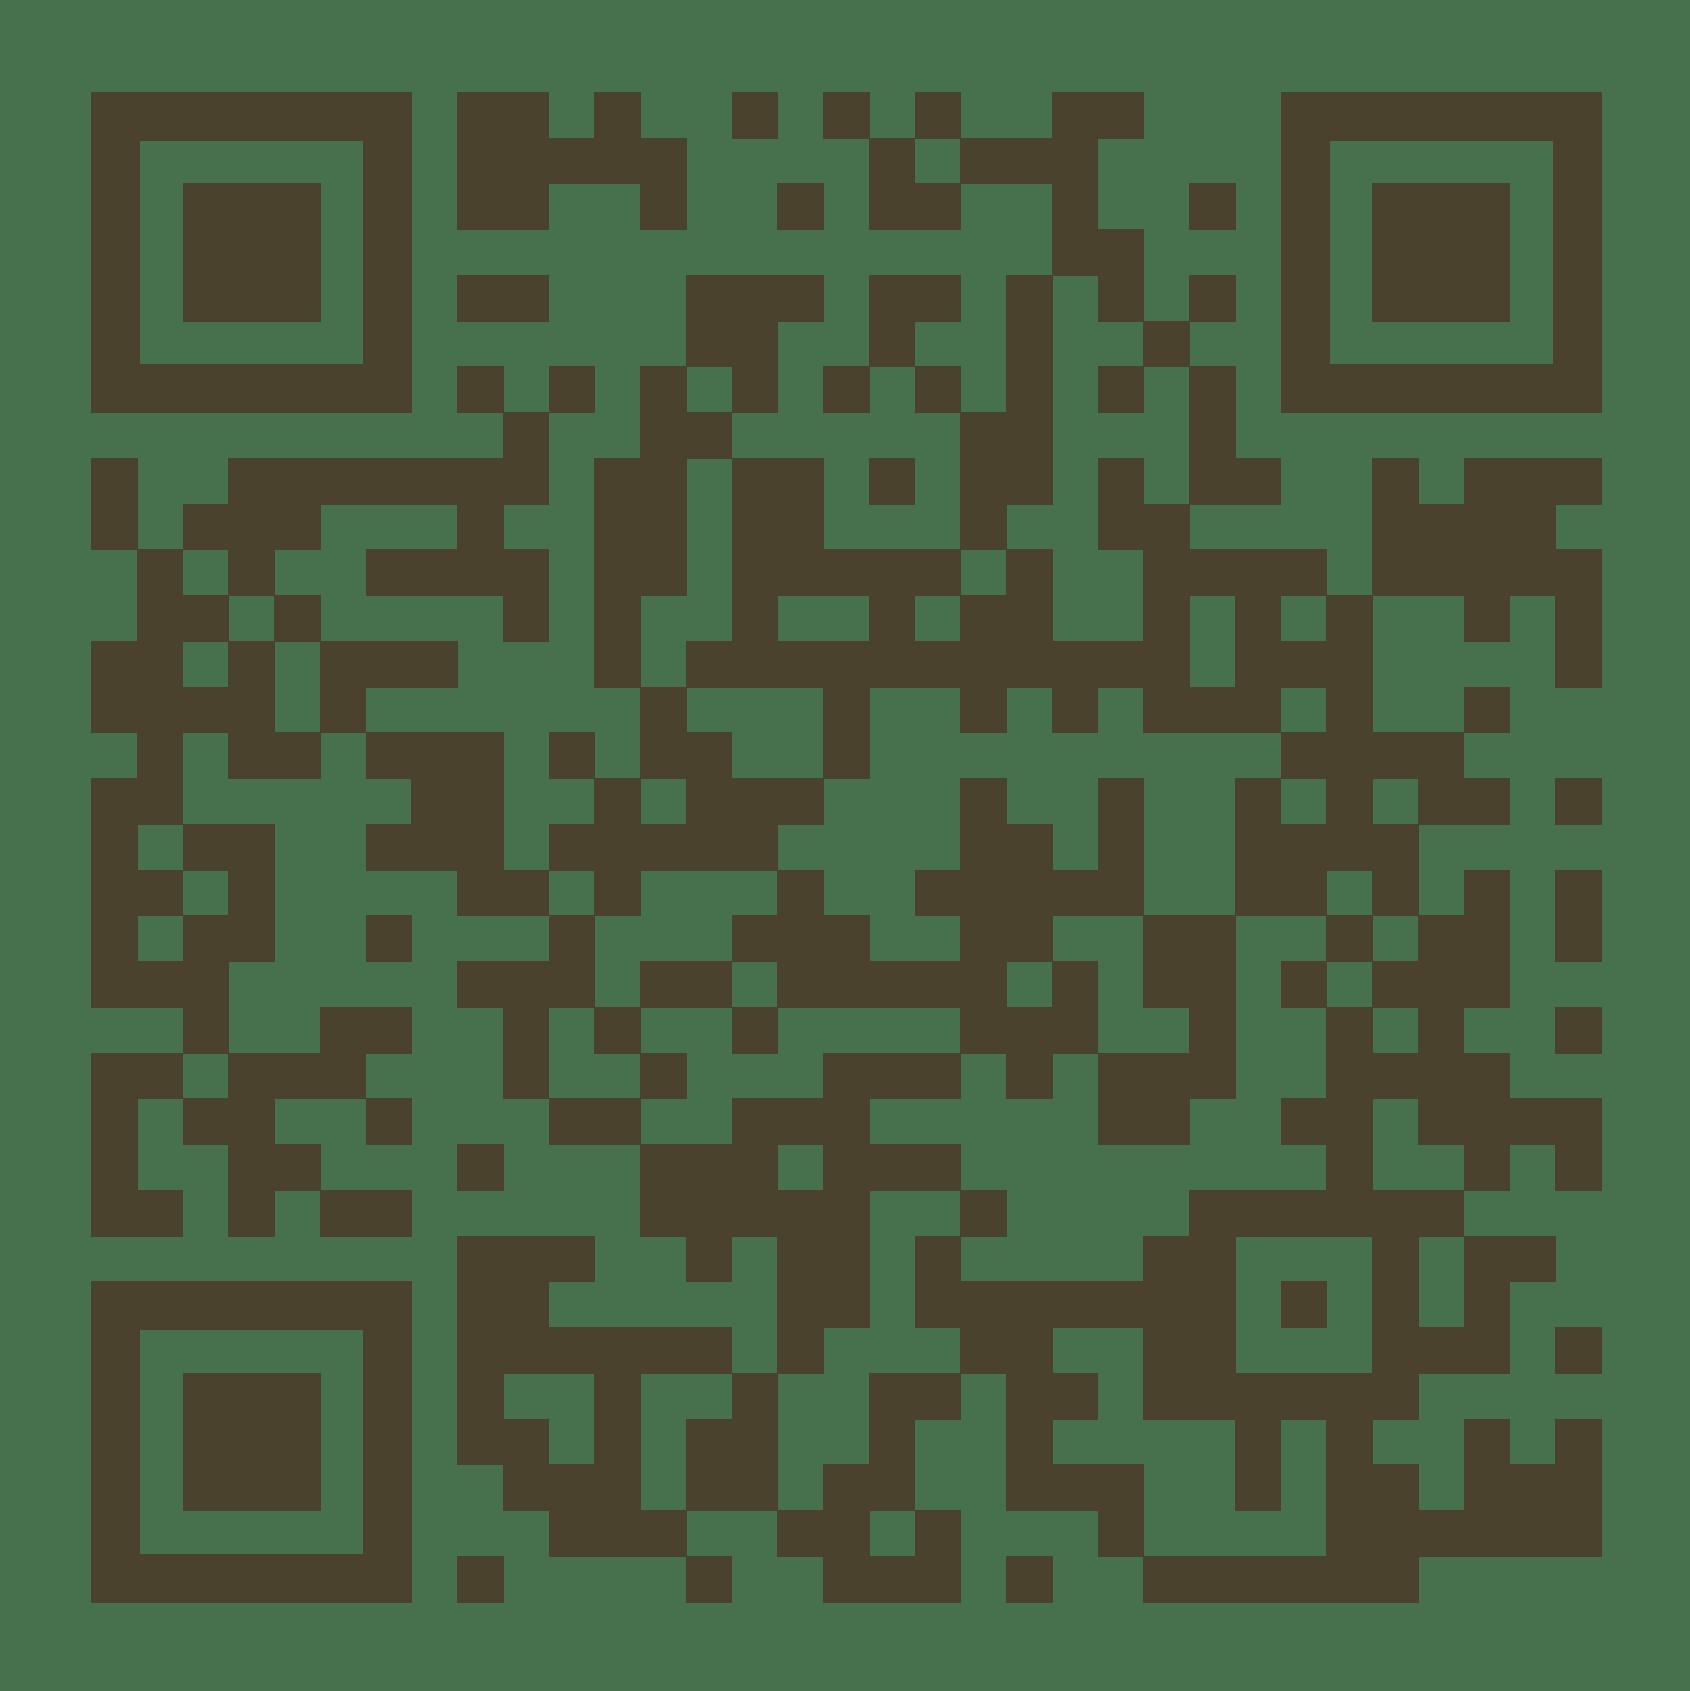 QR-Code Digitale Gästemappe Hofstelle No. 133